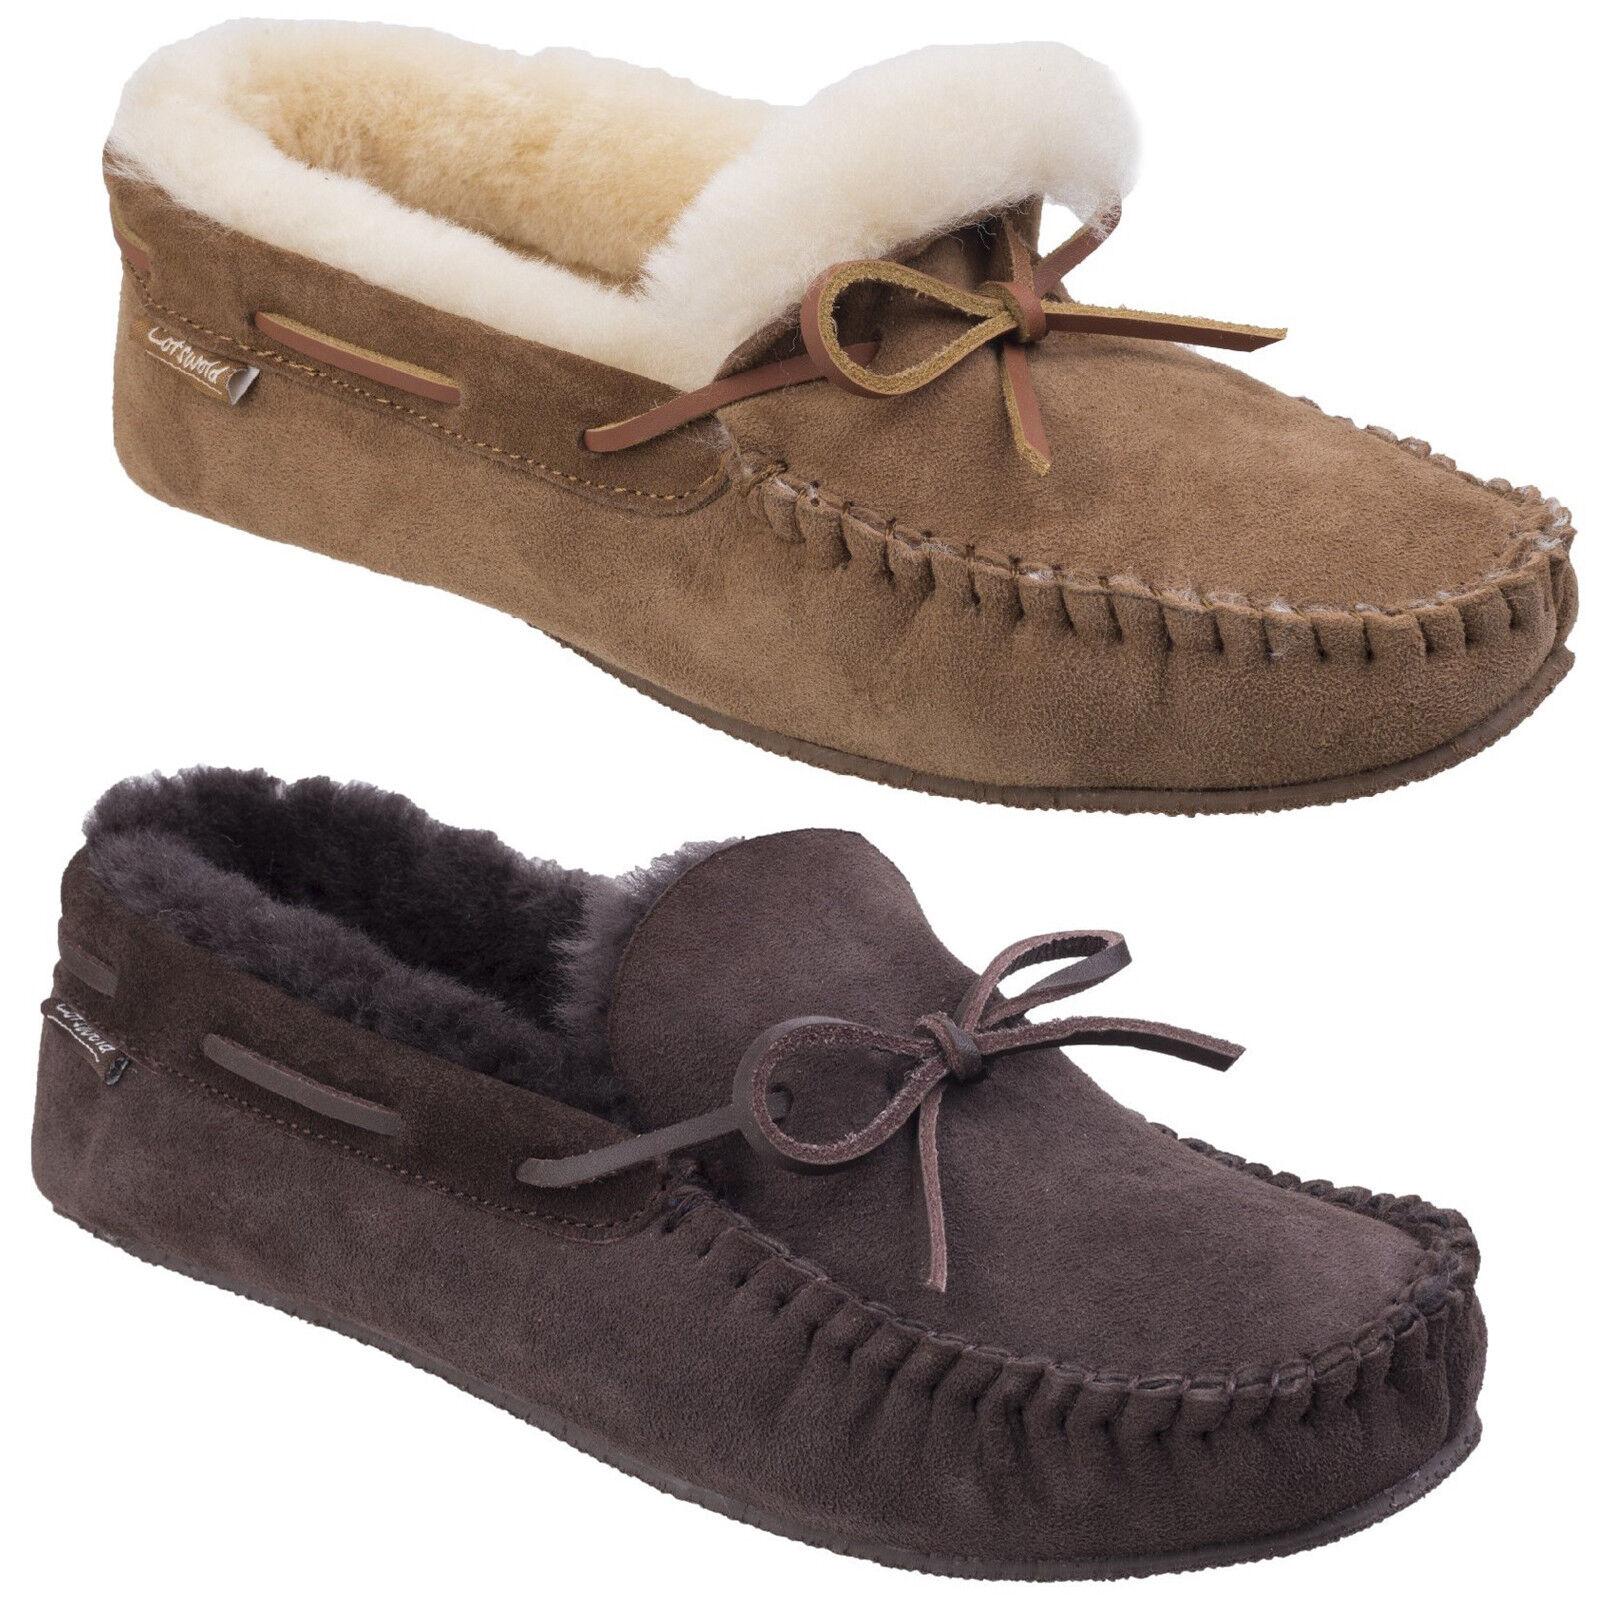 Cotswold CHASTLETON pelle di pecora MOCASSINI STILE CLASSICO, comfort Pantofole